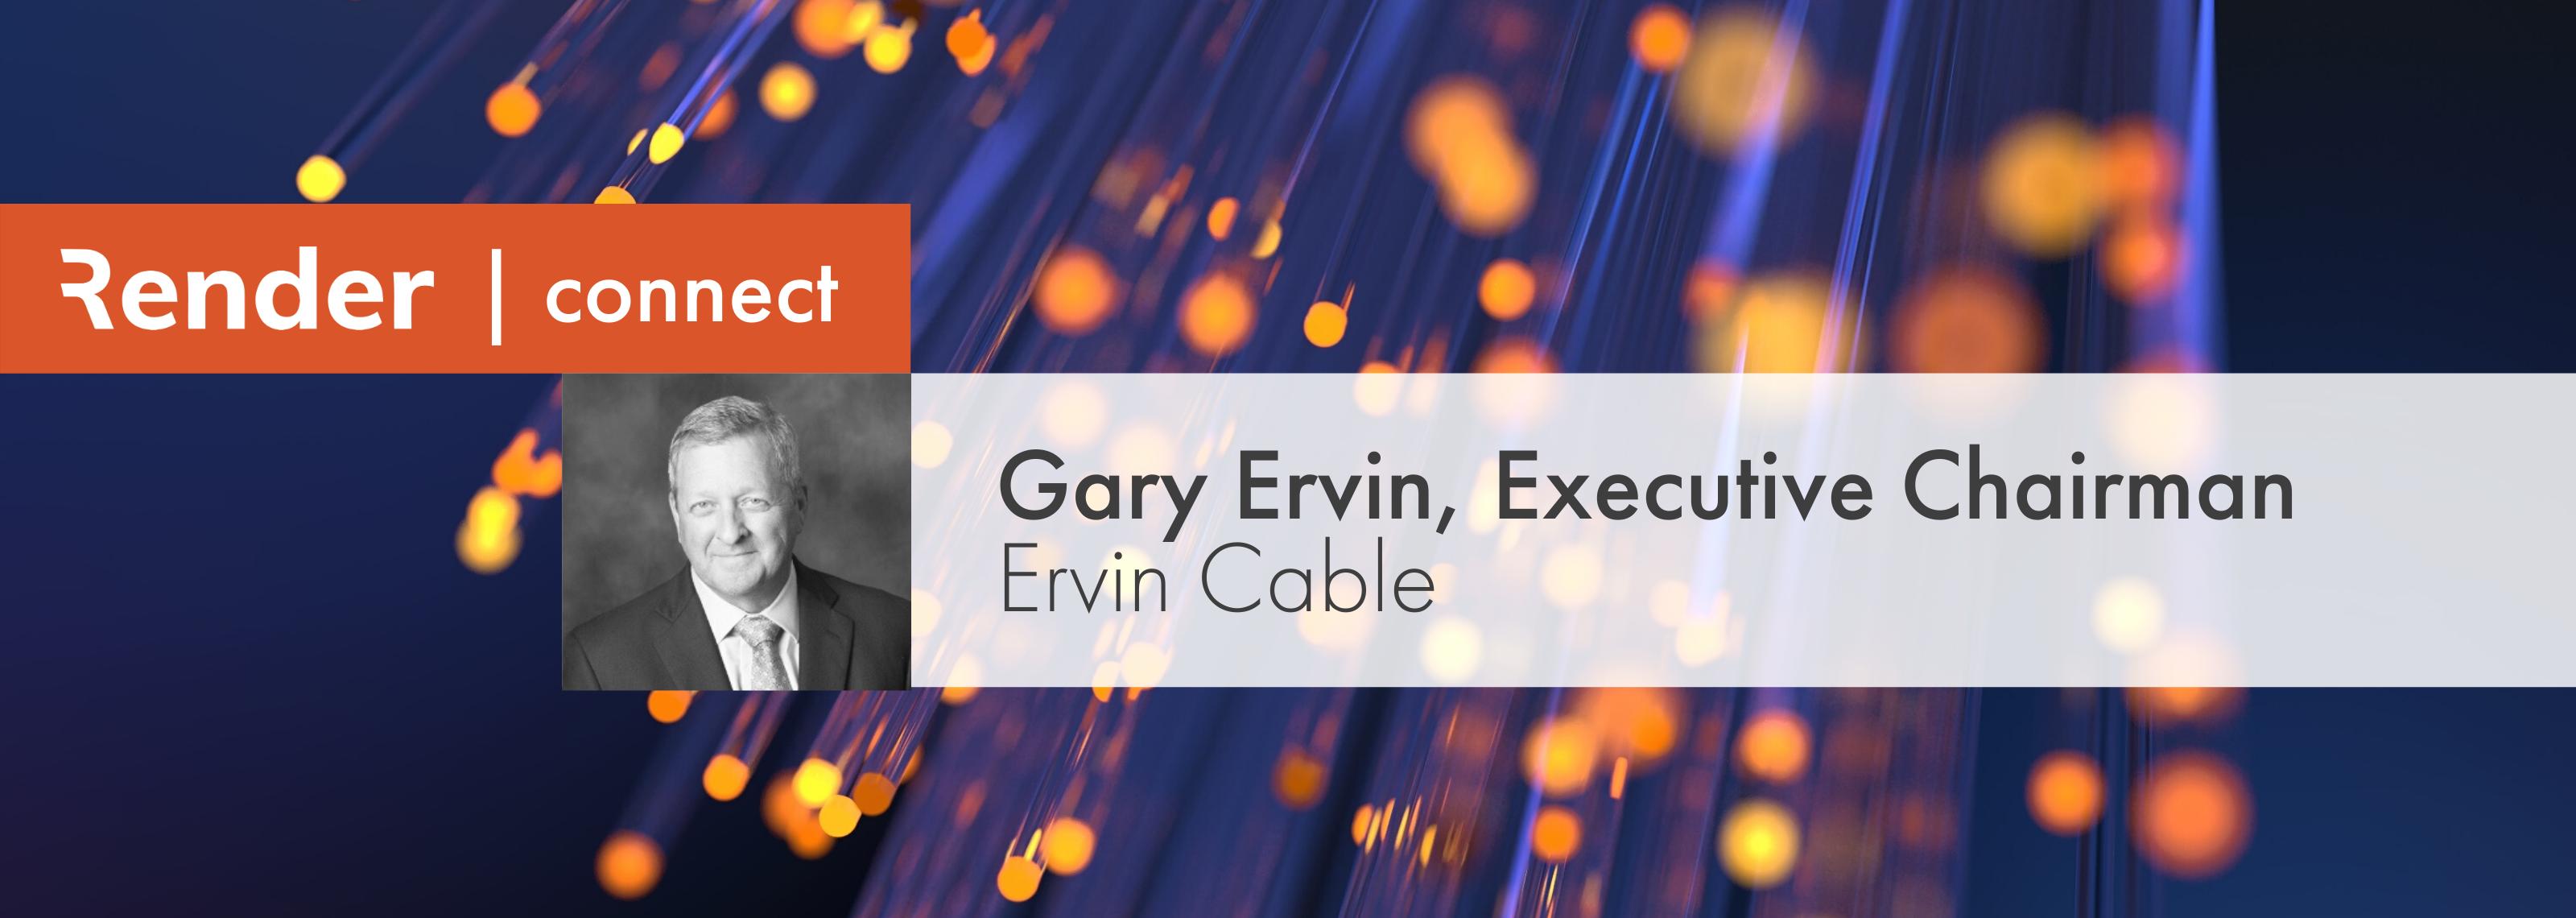 Render Connect_Gary Ervin_Header